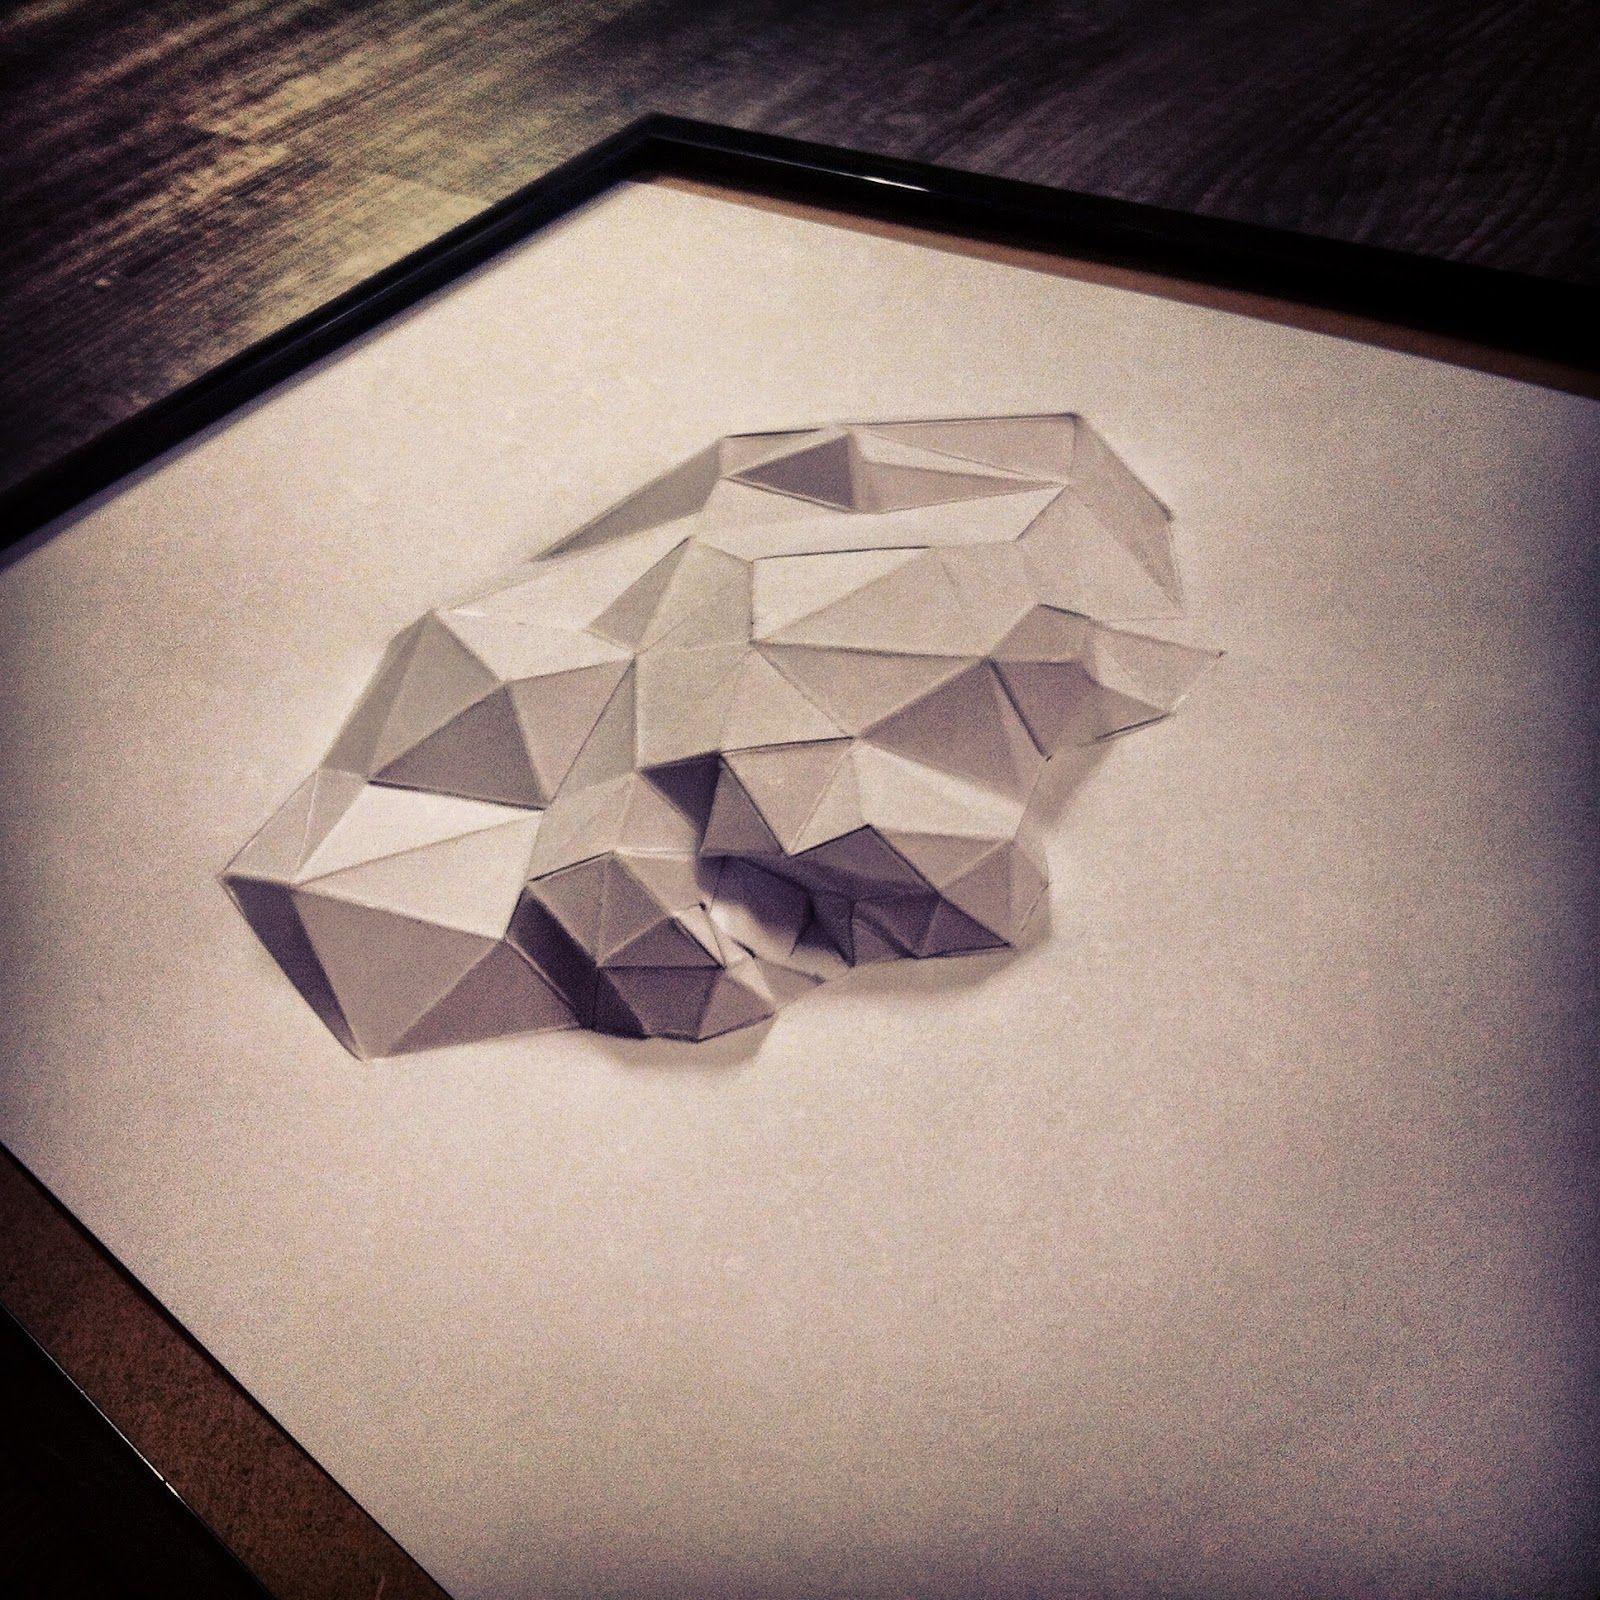 sculpture cadre lion en papier paper frame lion. Black Bedroom Furniture Sets. Home Design Ideas